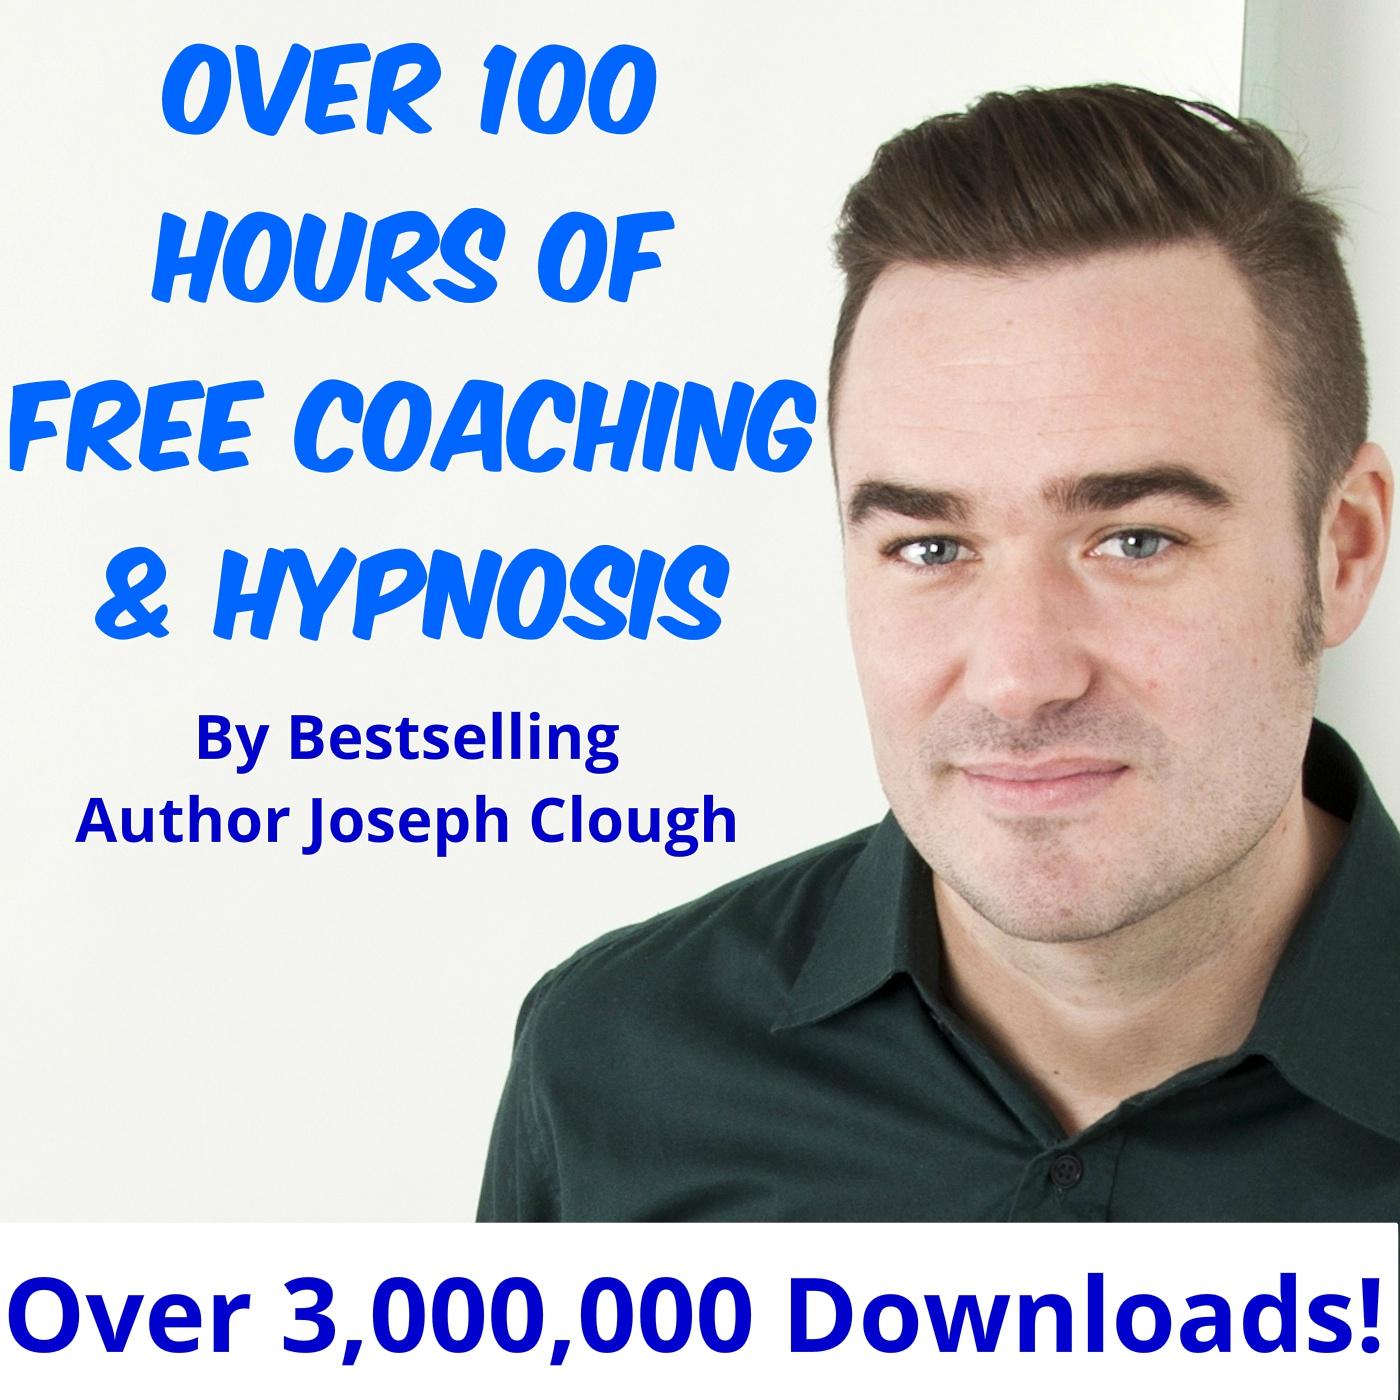 Joseph Clough's Hypnosis/Hypnotherapy MP3/CD Self Help Blog | Listen